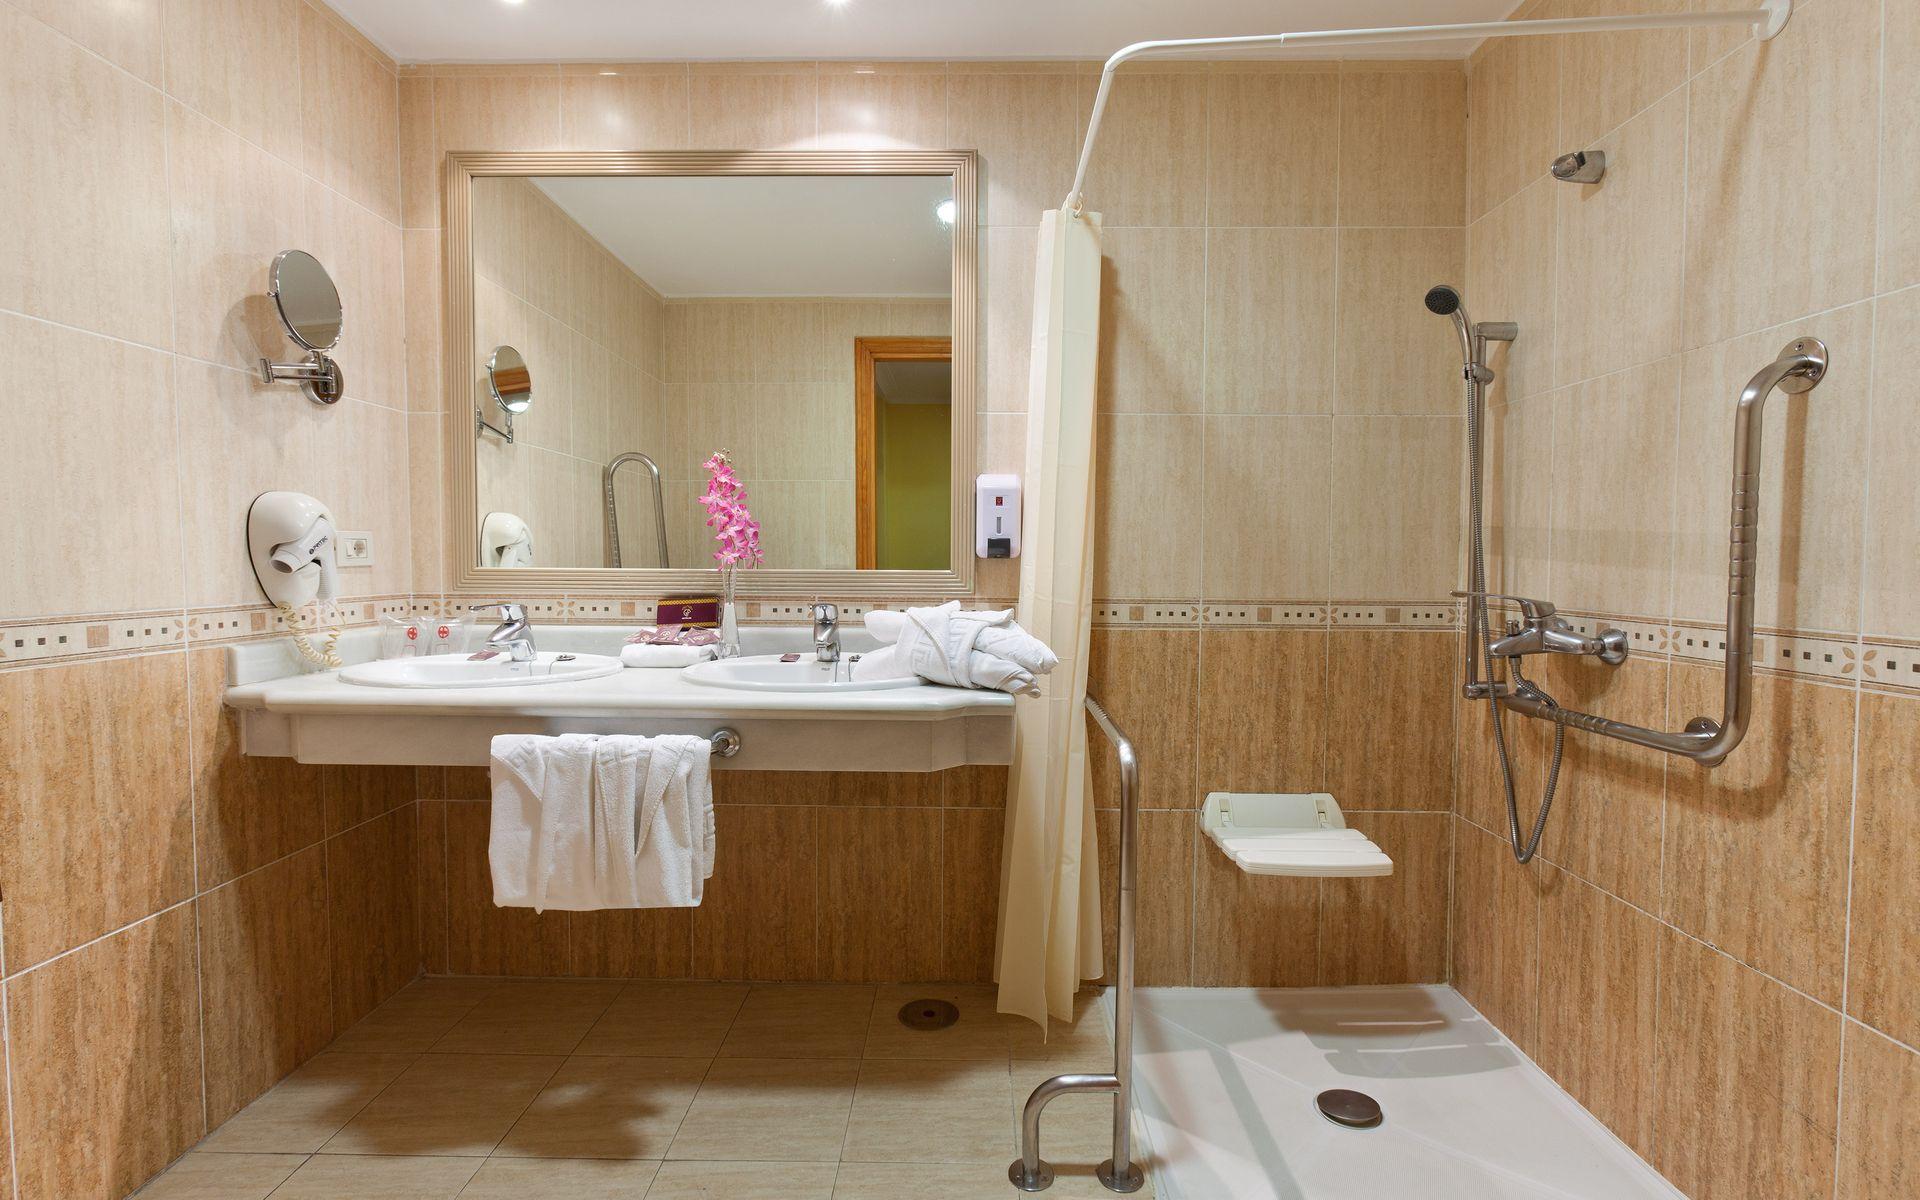 Hotel fa abe costa sur en costa adeje tenerife desde 43 for Habitacion familiar tenerife